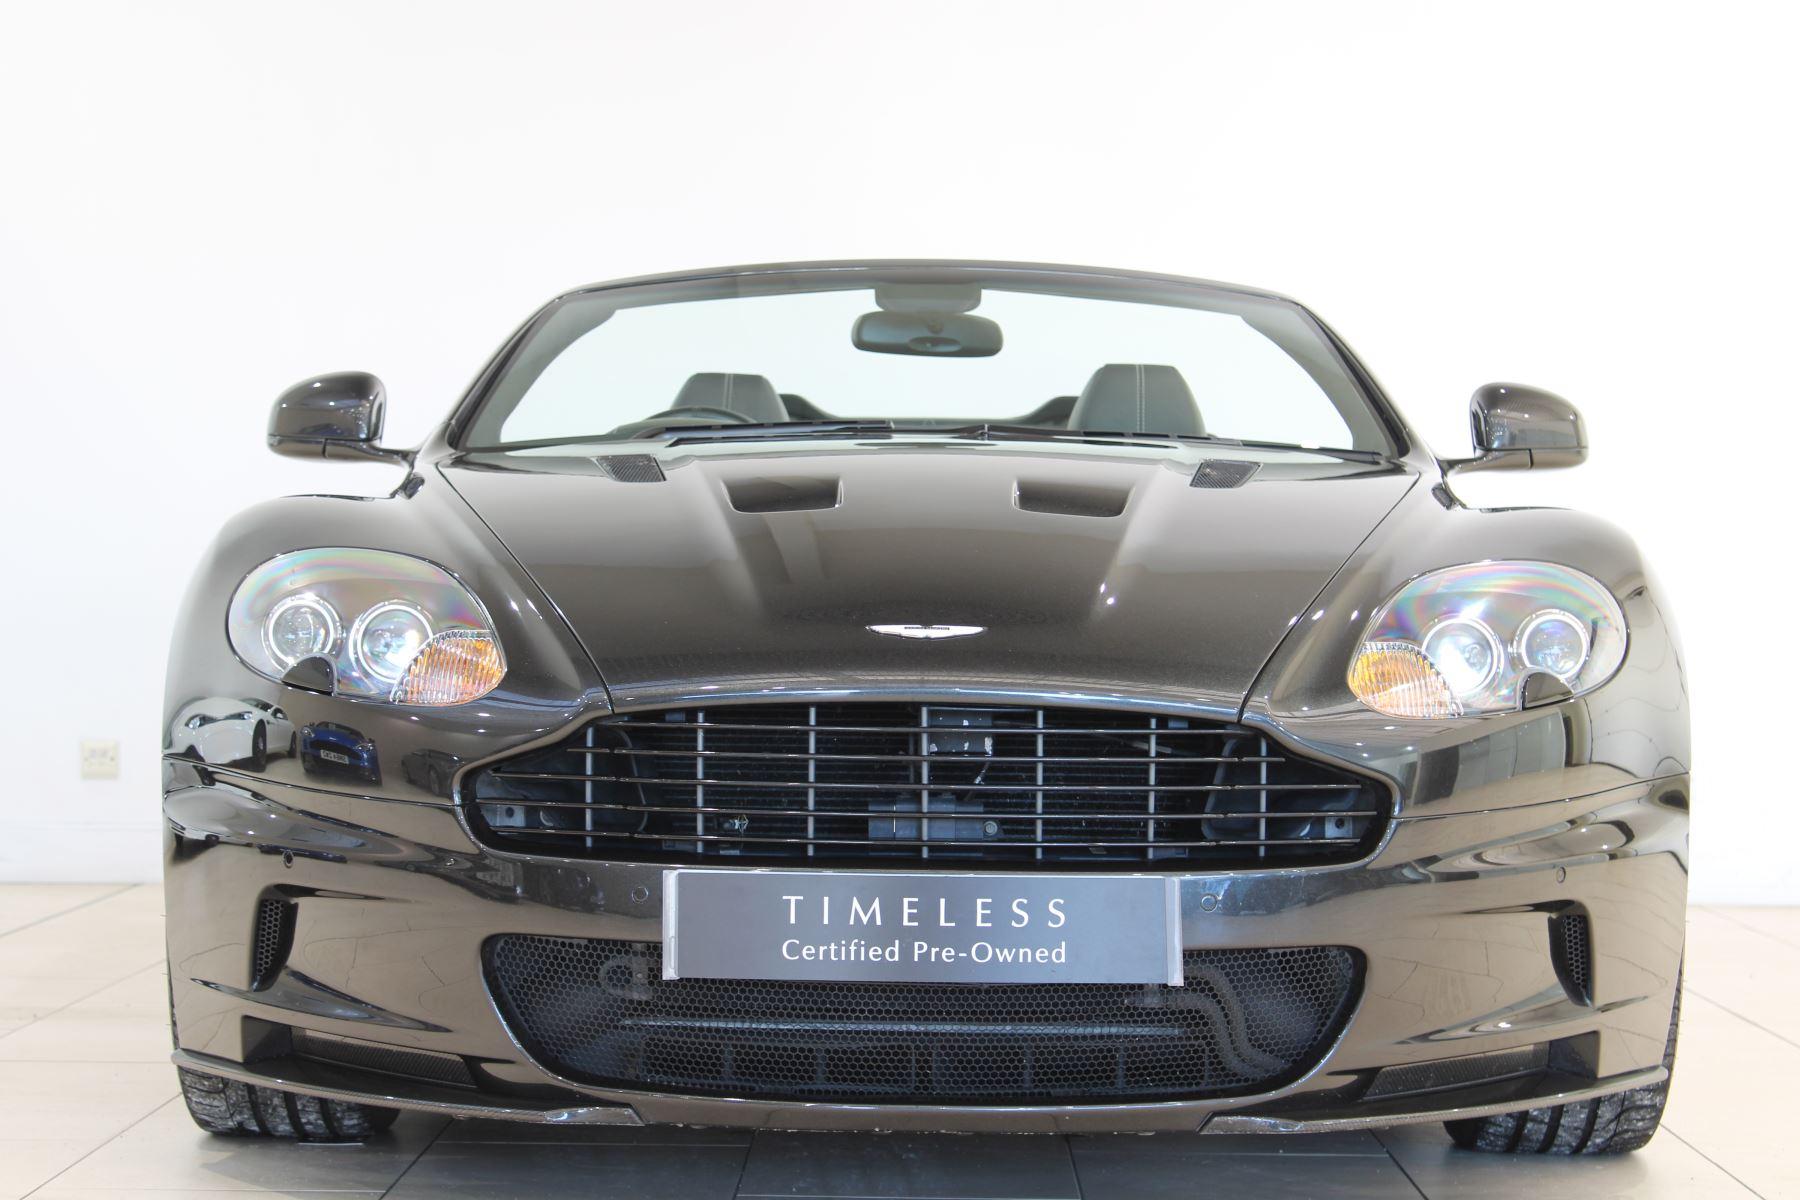 Aston Martin DBS CARBON V12 2dr Volante Touchtronic image 3